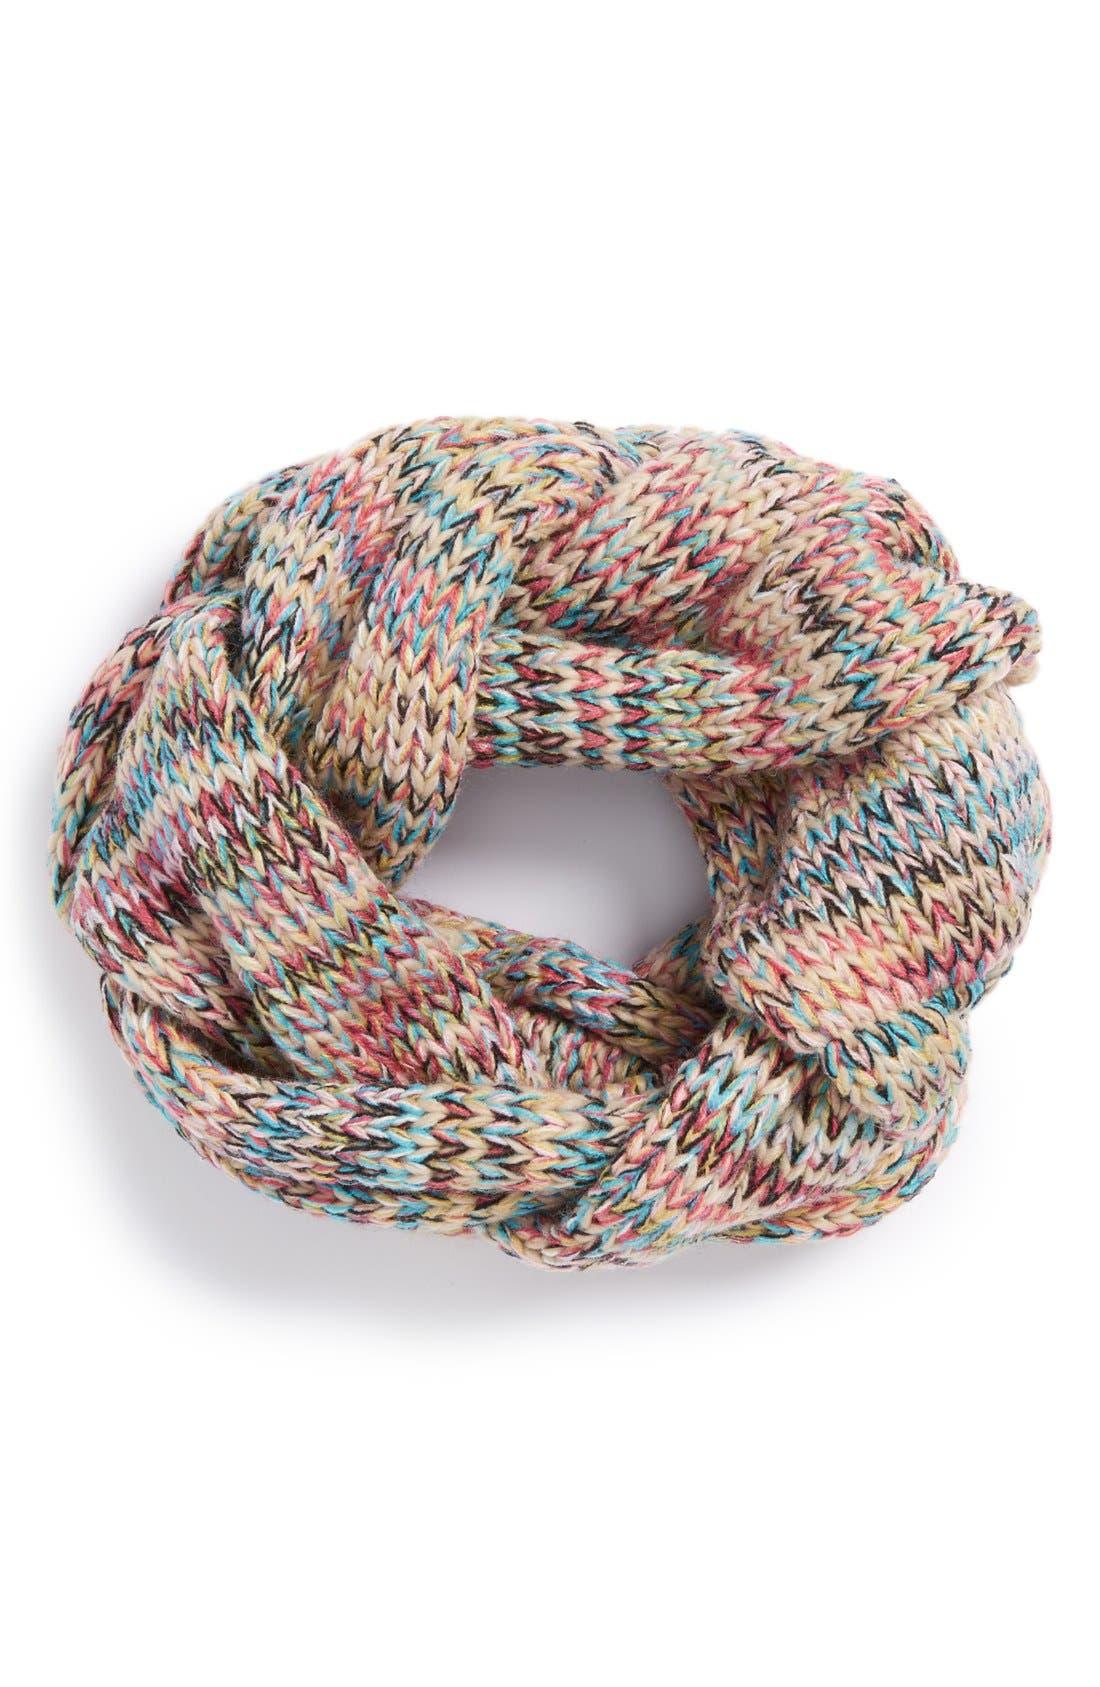 Alternate Image 1 Selected - Tucker + Tate Knit Snood (Girls)